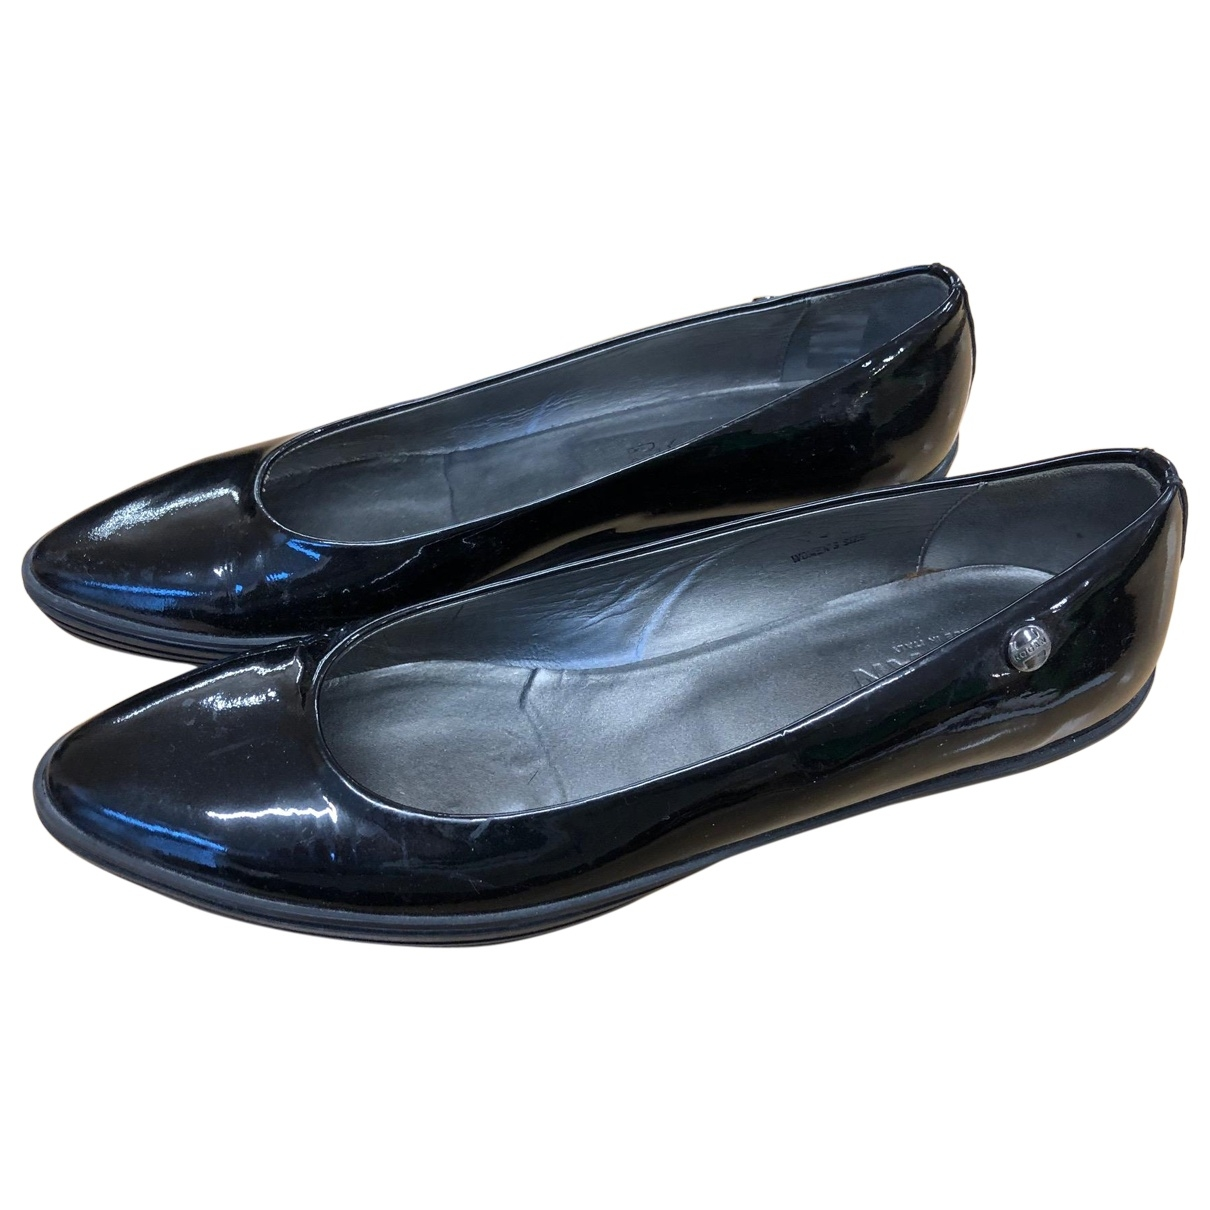 Hogan \N Black Patent leather Flats for Women 38.5 EU